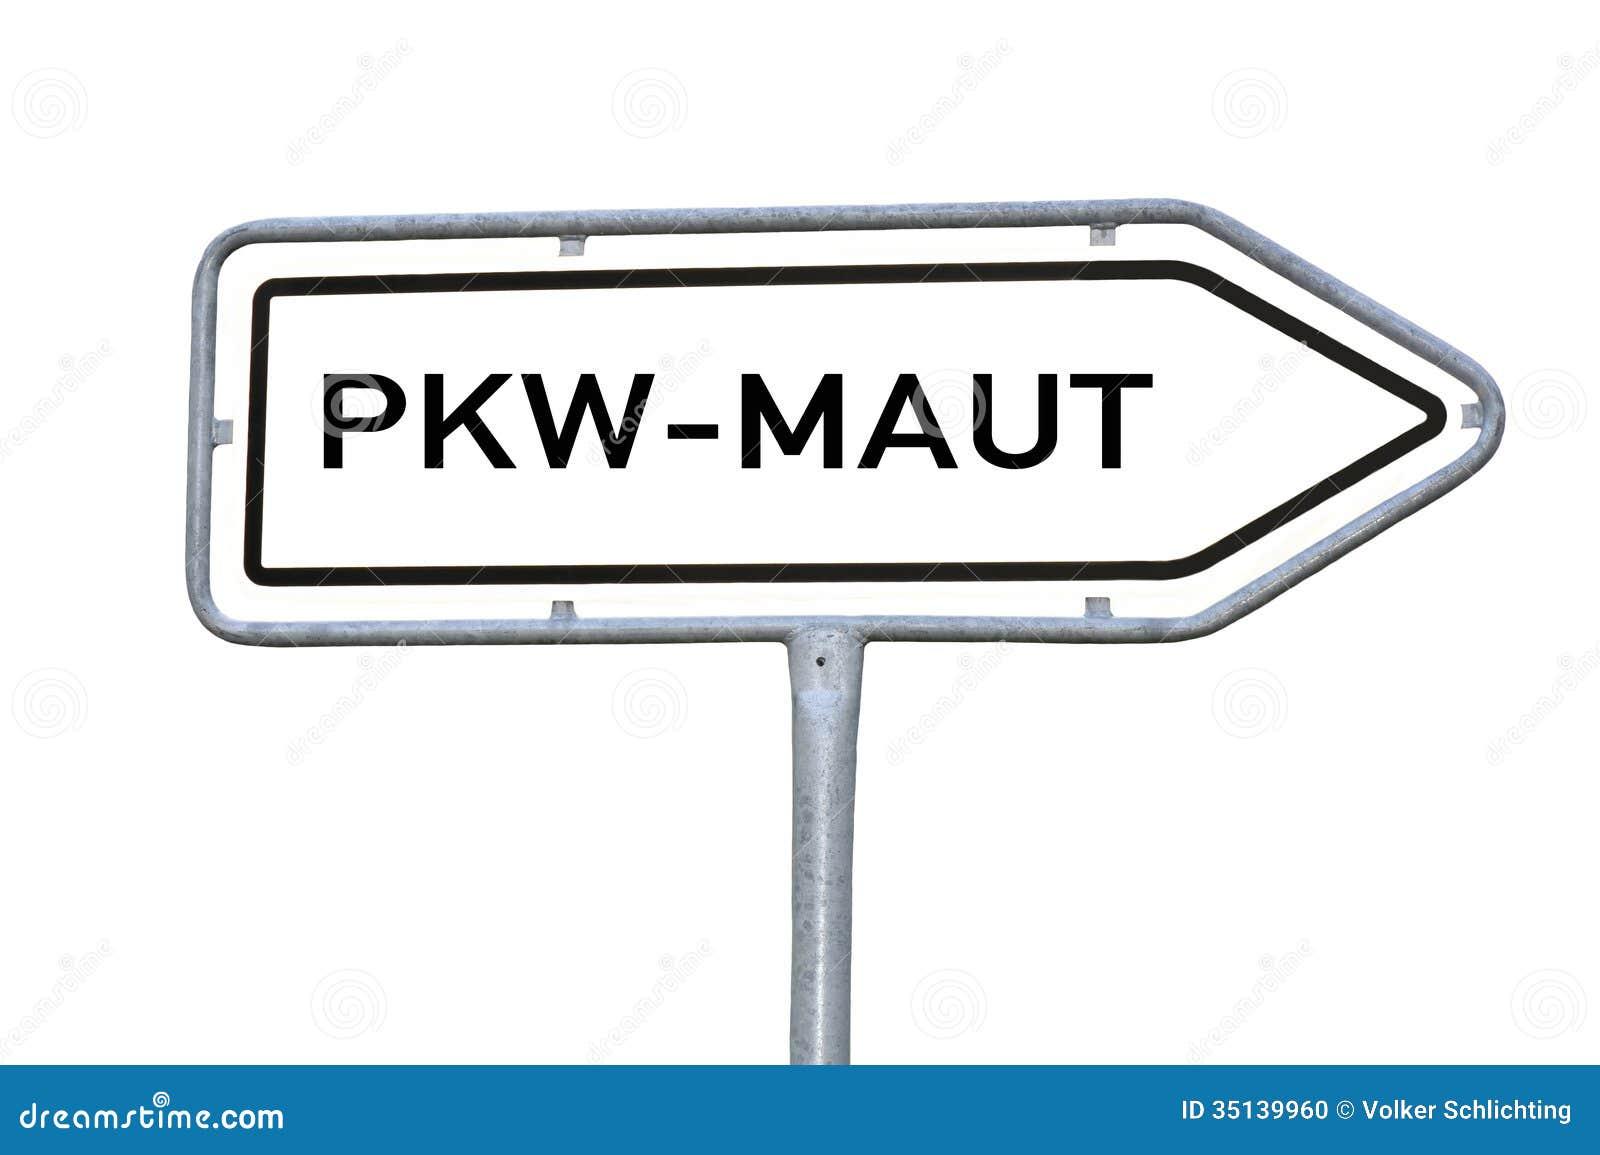 information sign car toll pkw maut stock photo image 35139960. Black Bedroom Furniture Sets. Home Design Ideas